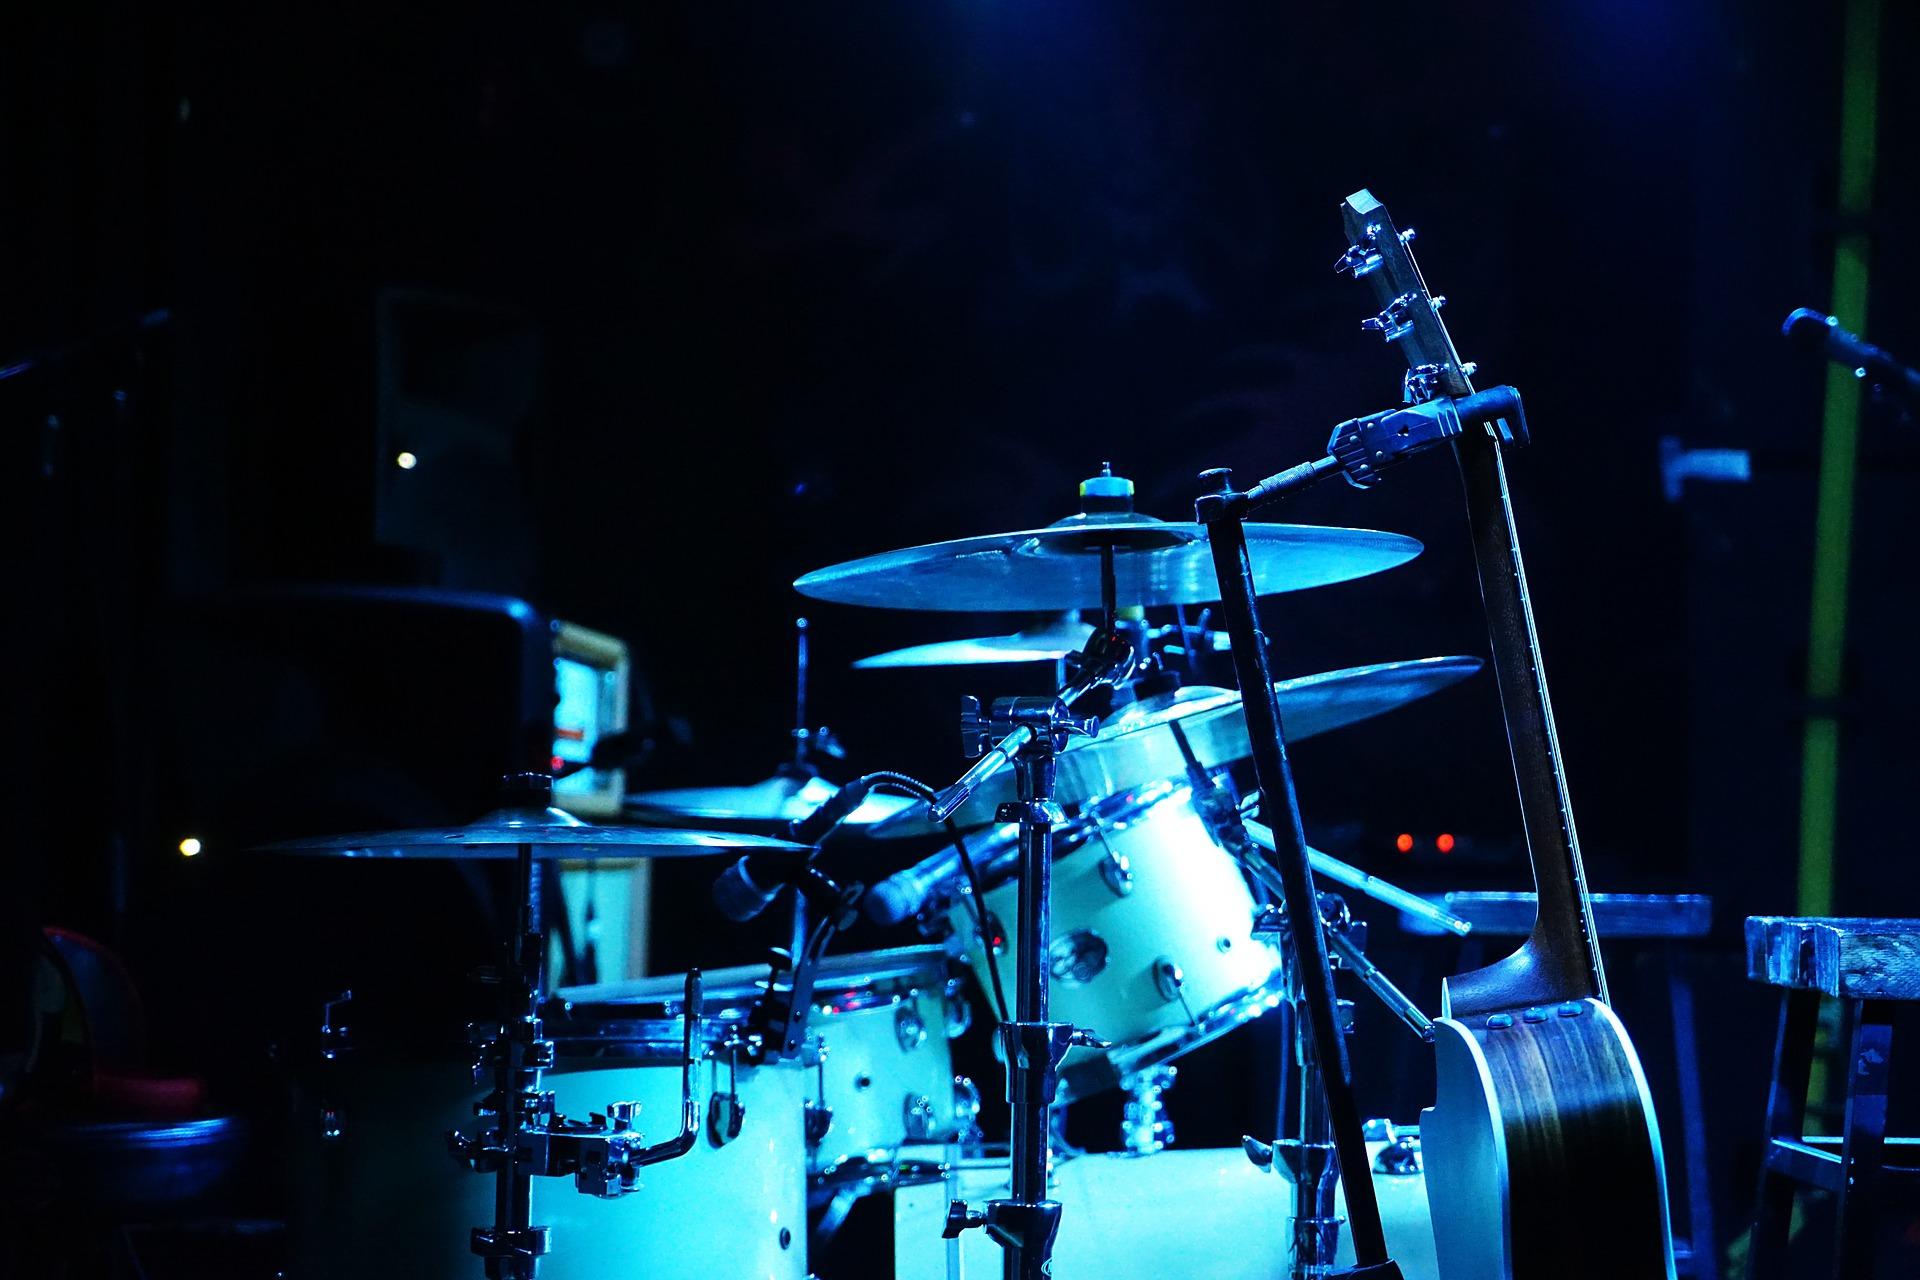 drummers in popular culture